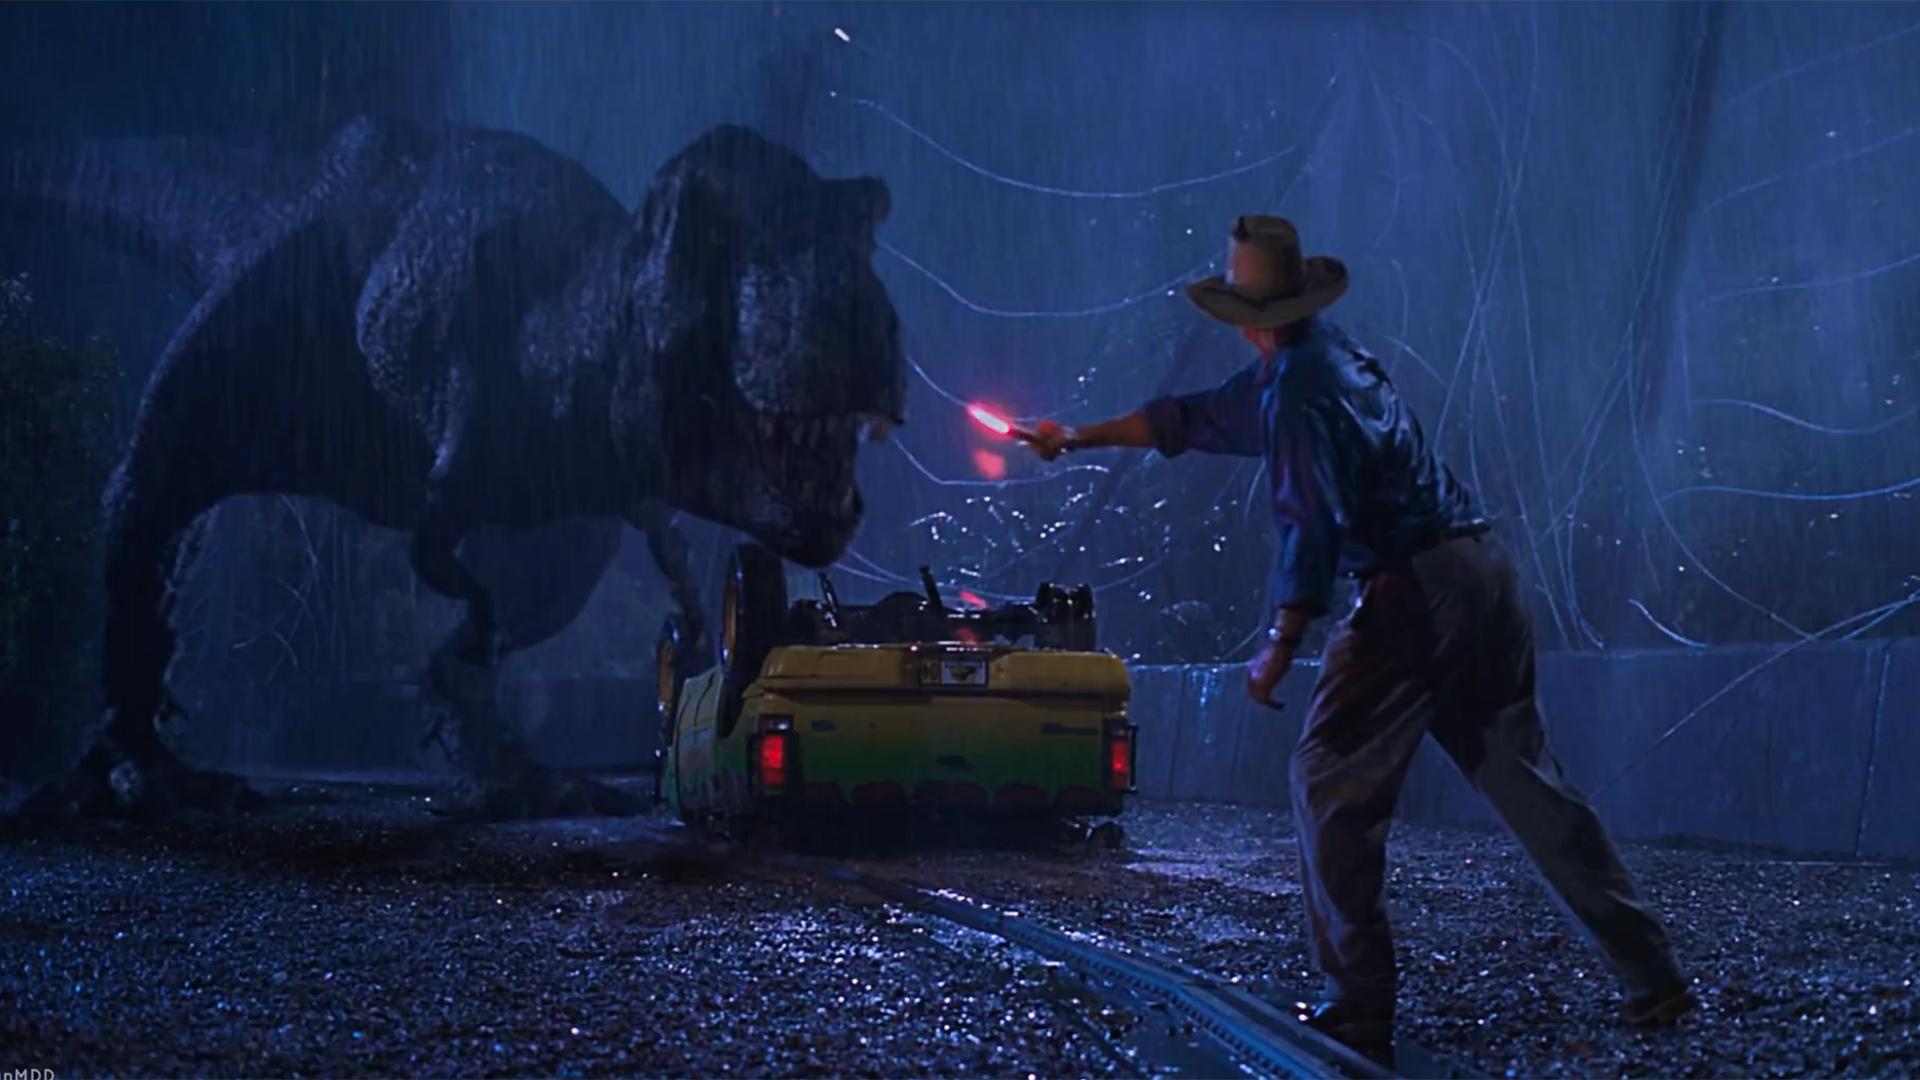 Jurassic Park retrospective